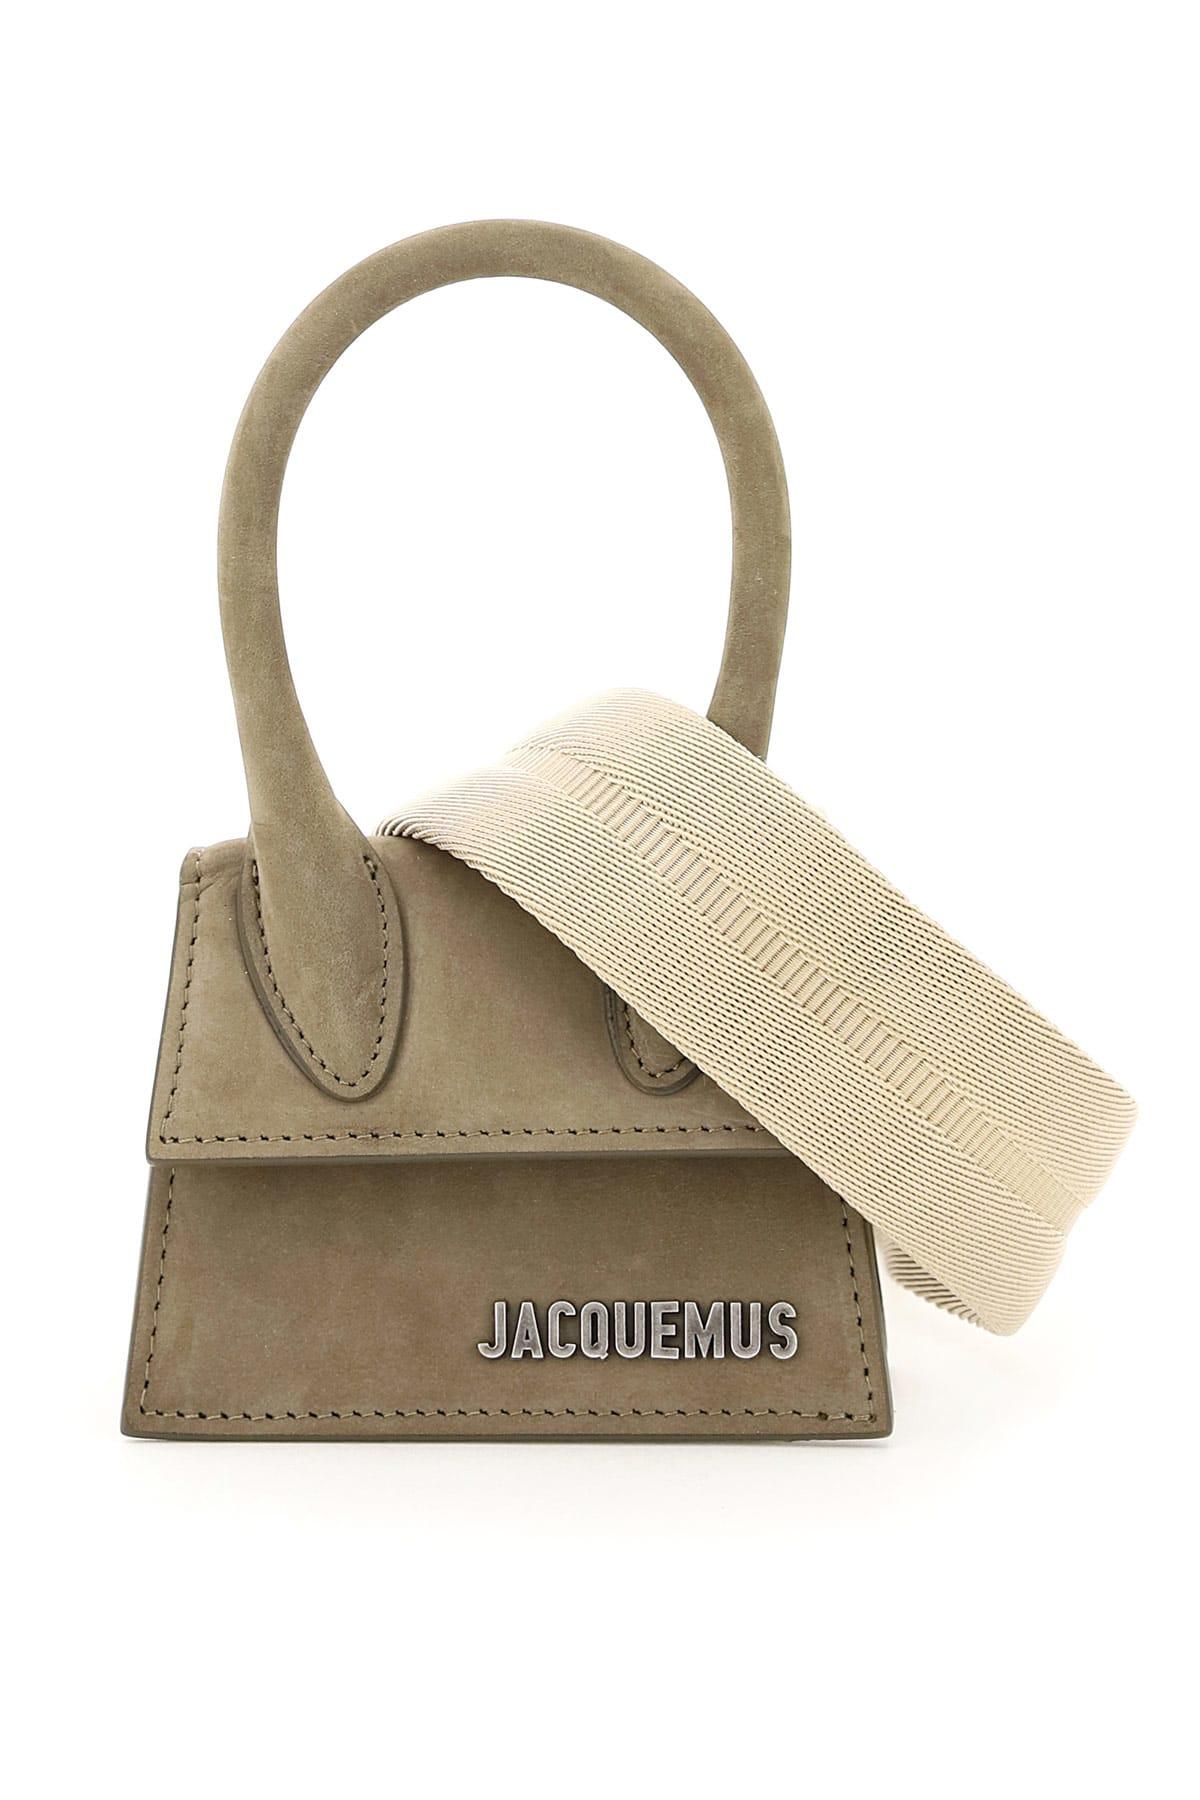 Jacquemus LE CHIQUITO MICRO BAG